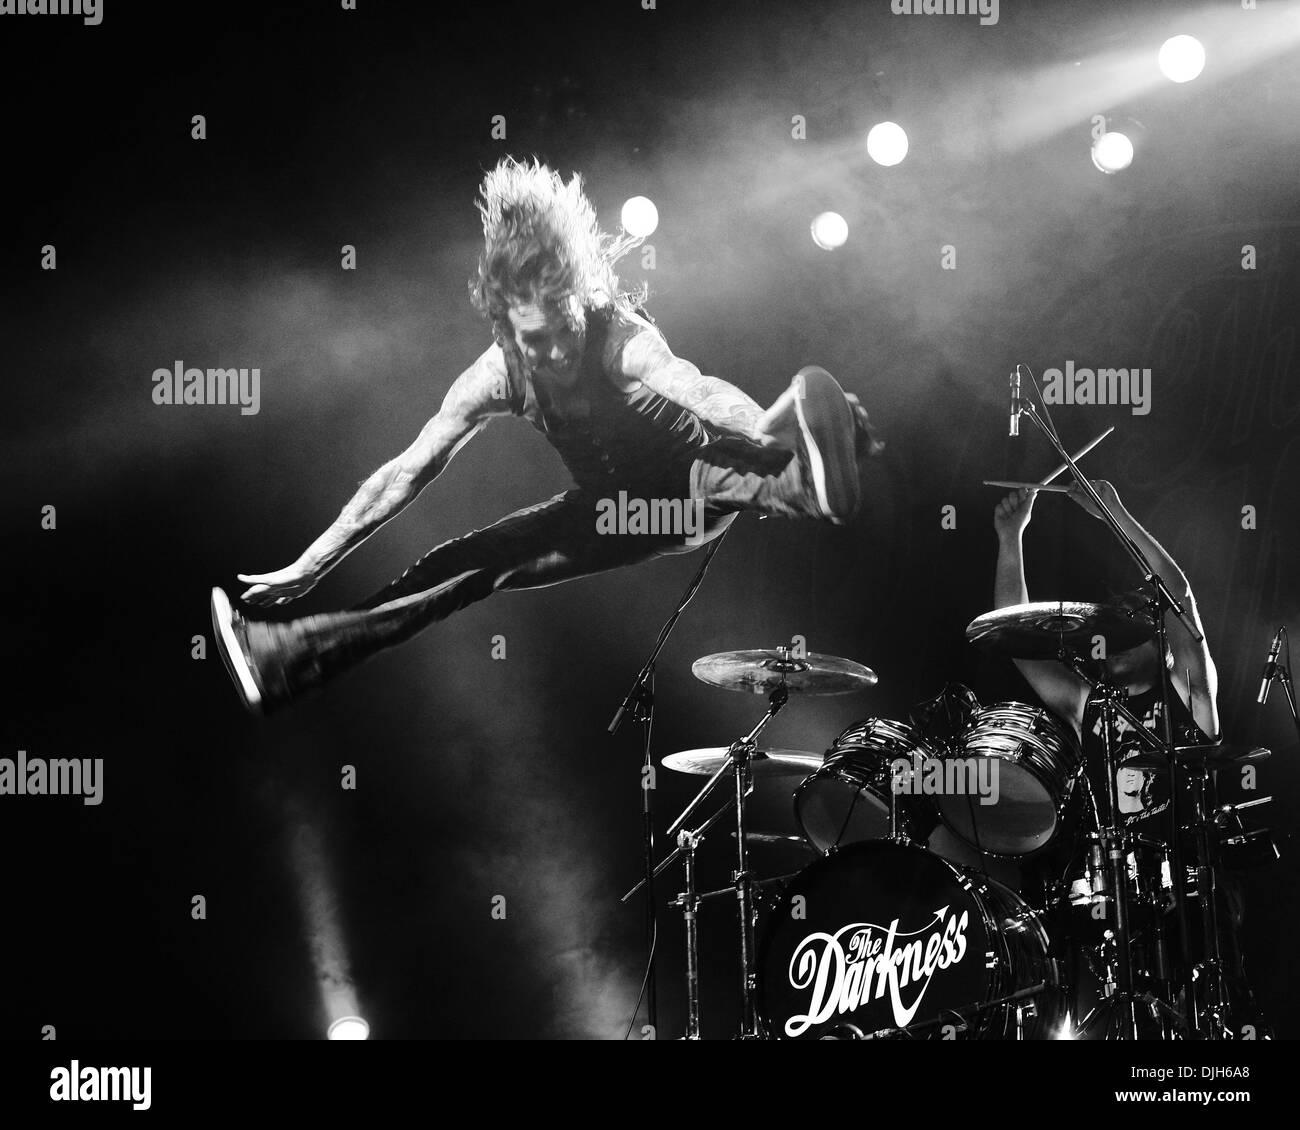 Justin Hawkins The Darkness live at Thebarton Theatre Adelaide, Australia - 17-05-12 , - Stock Image